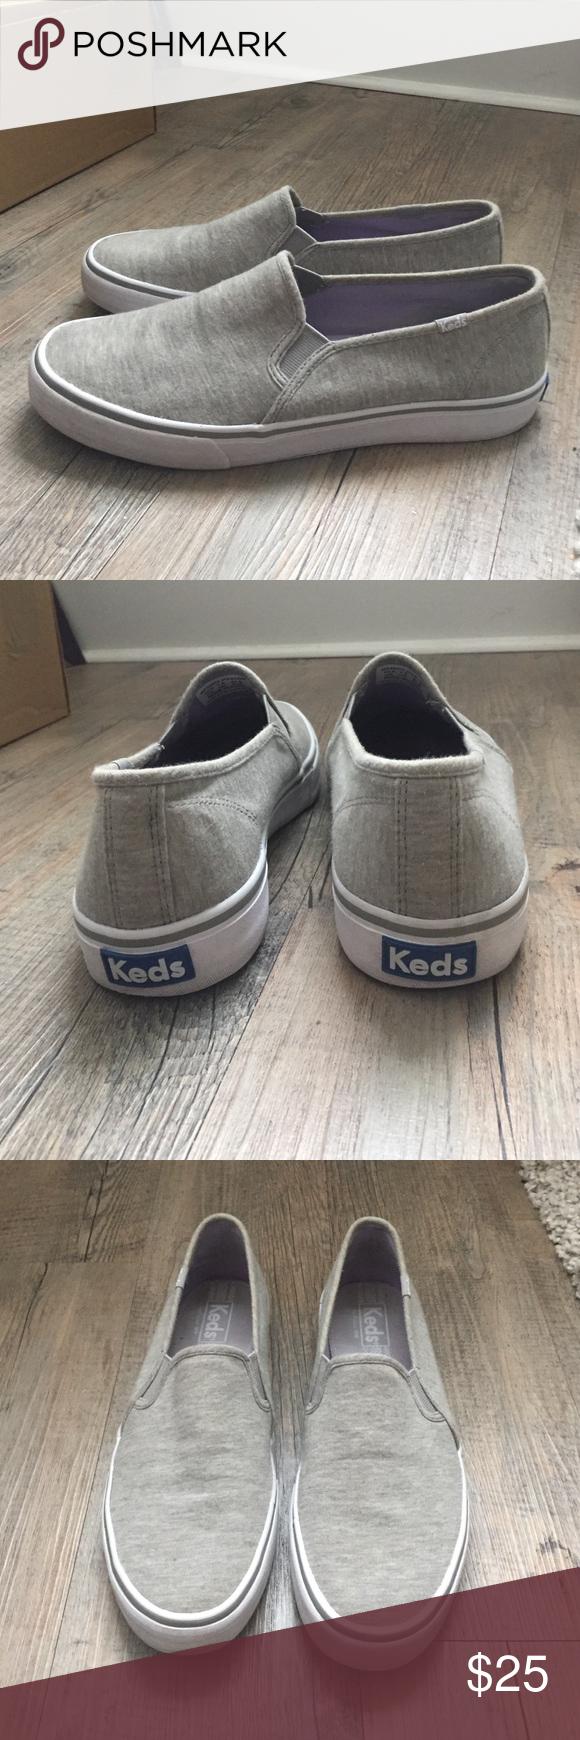 Keds Double Decker Jersey Women's Slip